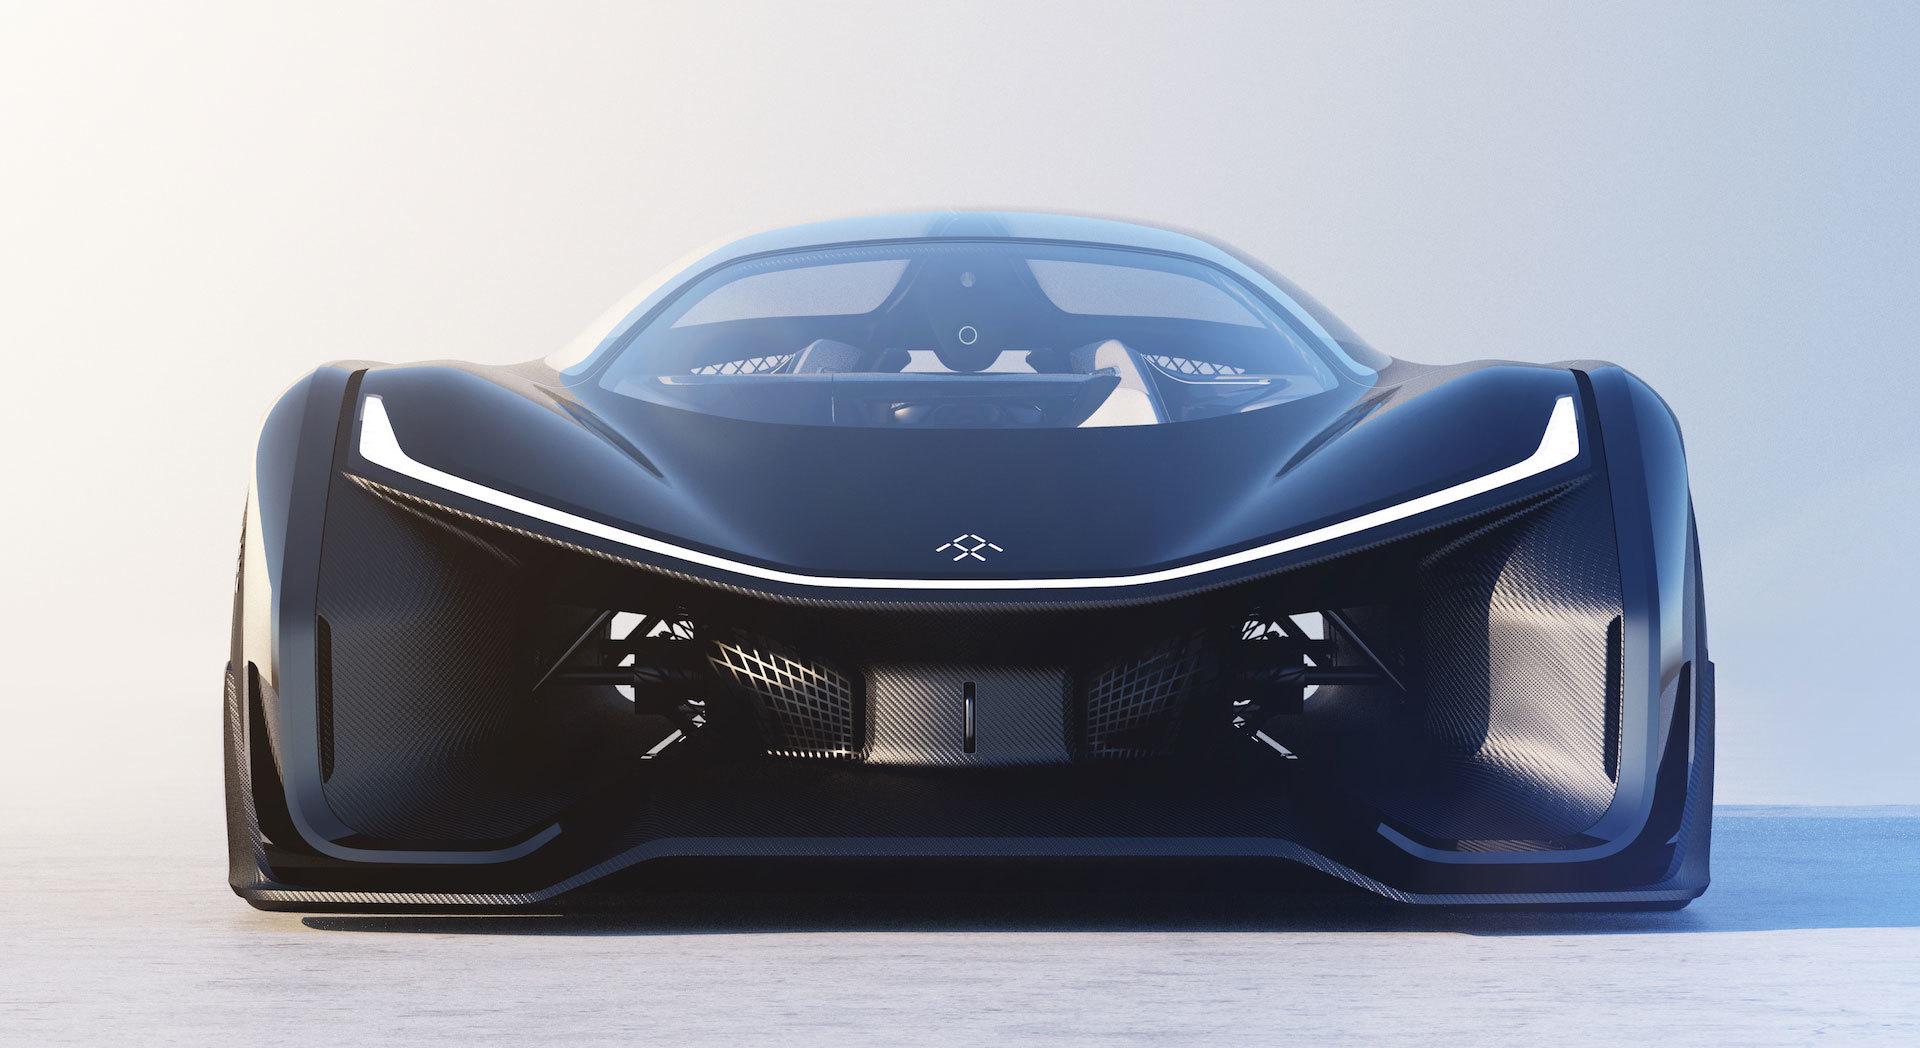 Faraday Future представила концепт модульной платформы электромобилей и суперкар FFZERO1 - 5